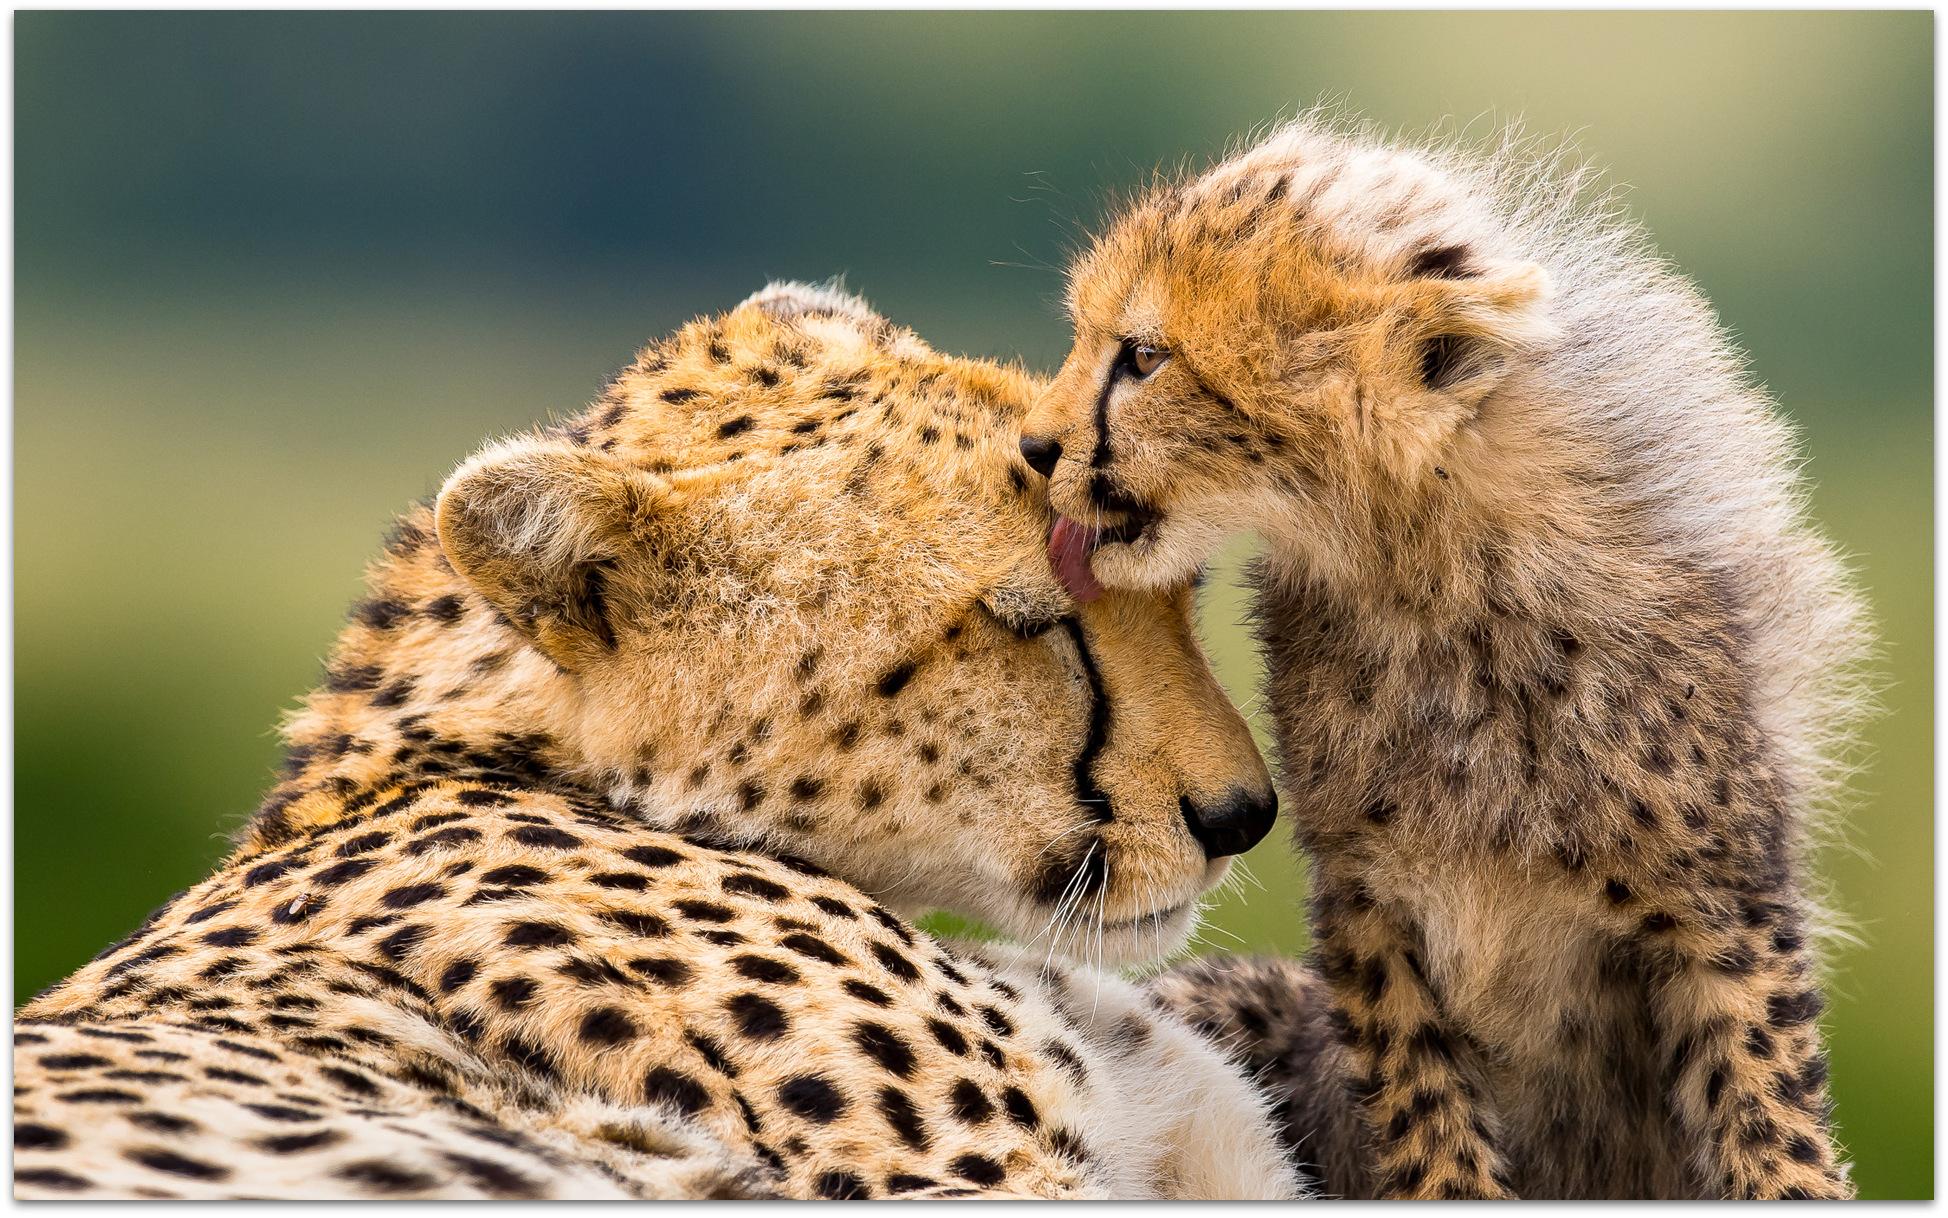 Cheetah cub and mom in the Maasai Mara